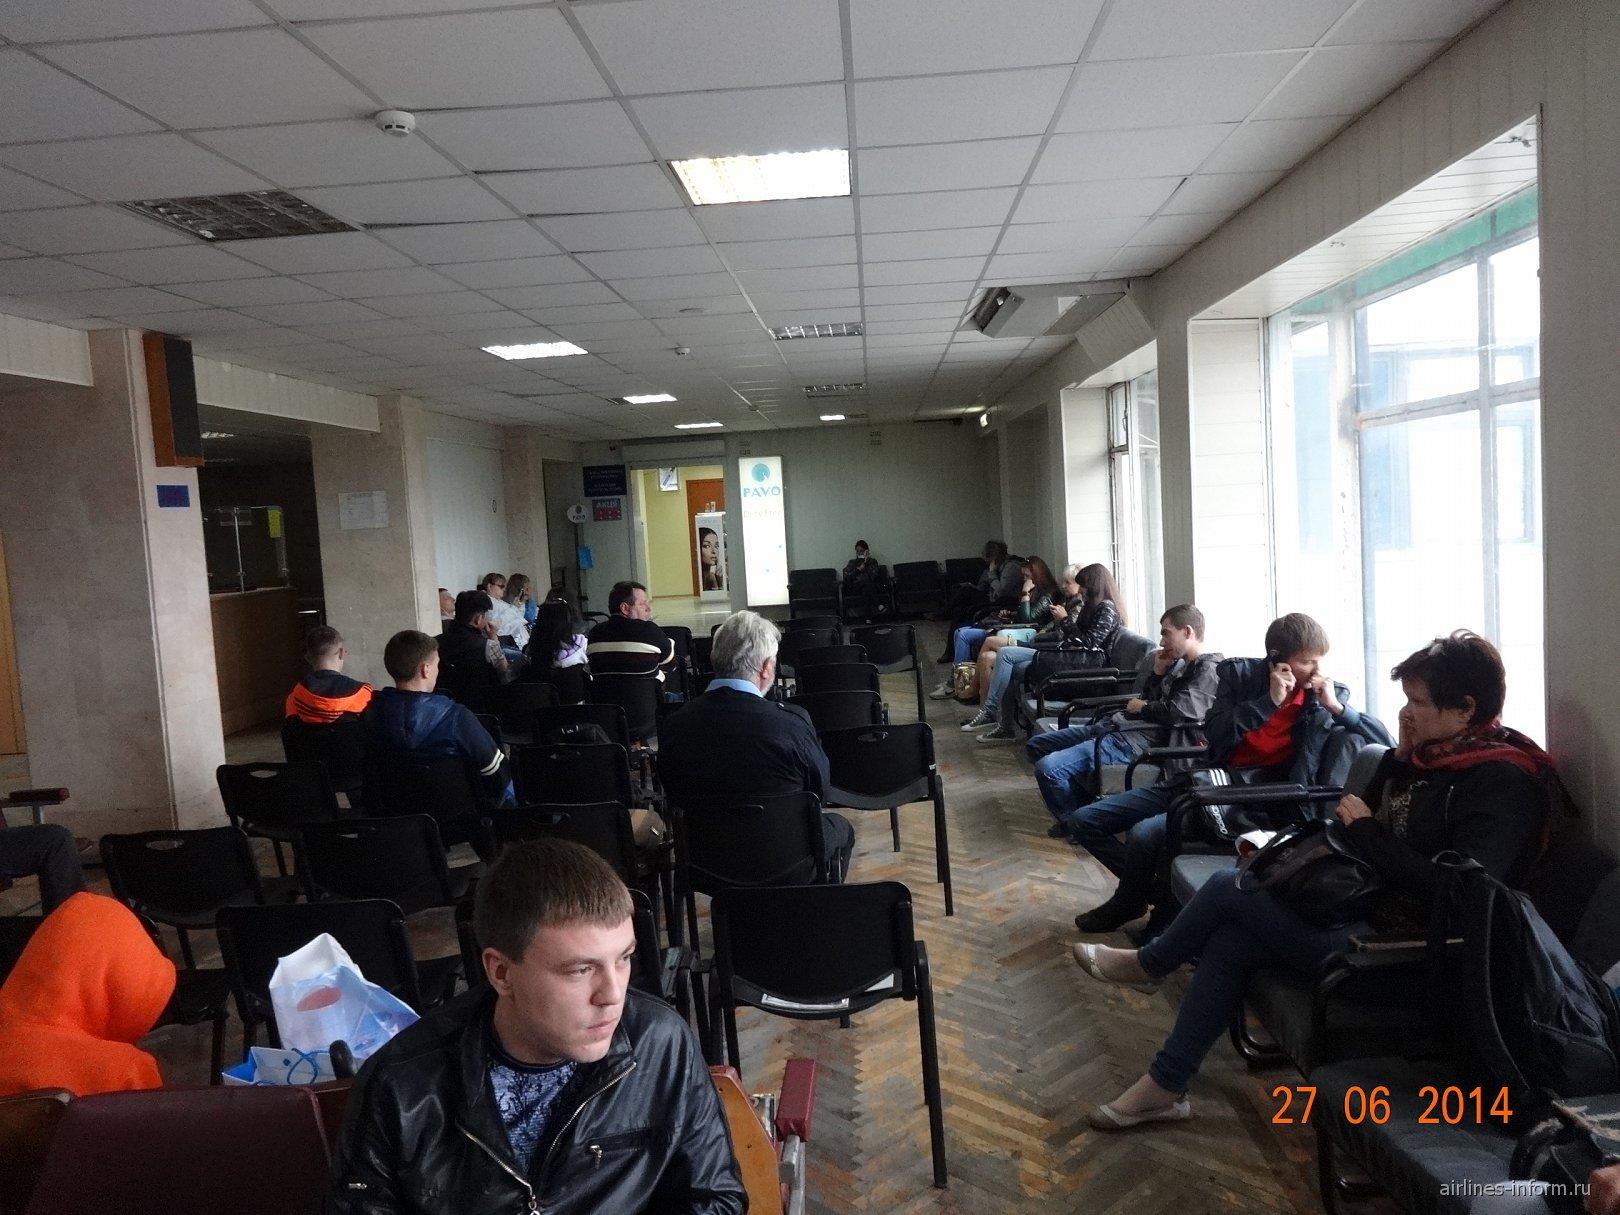 Аэропорт Запорожье